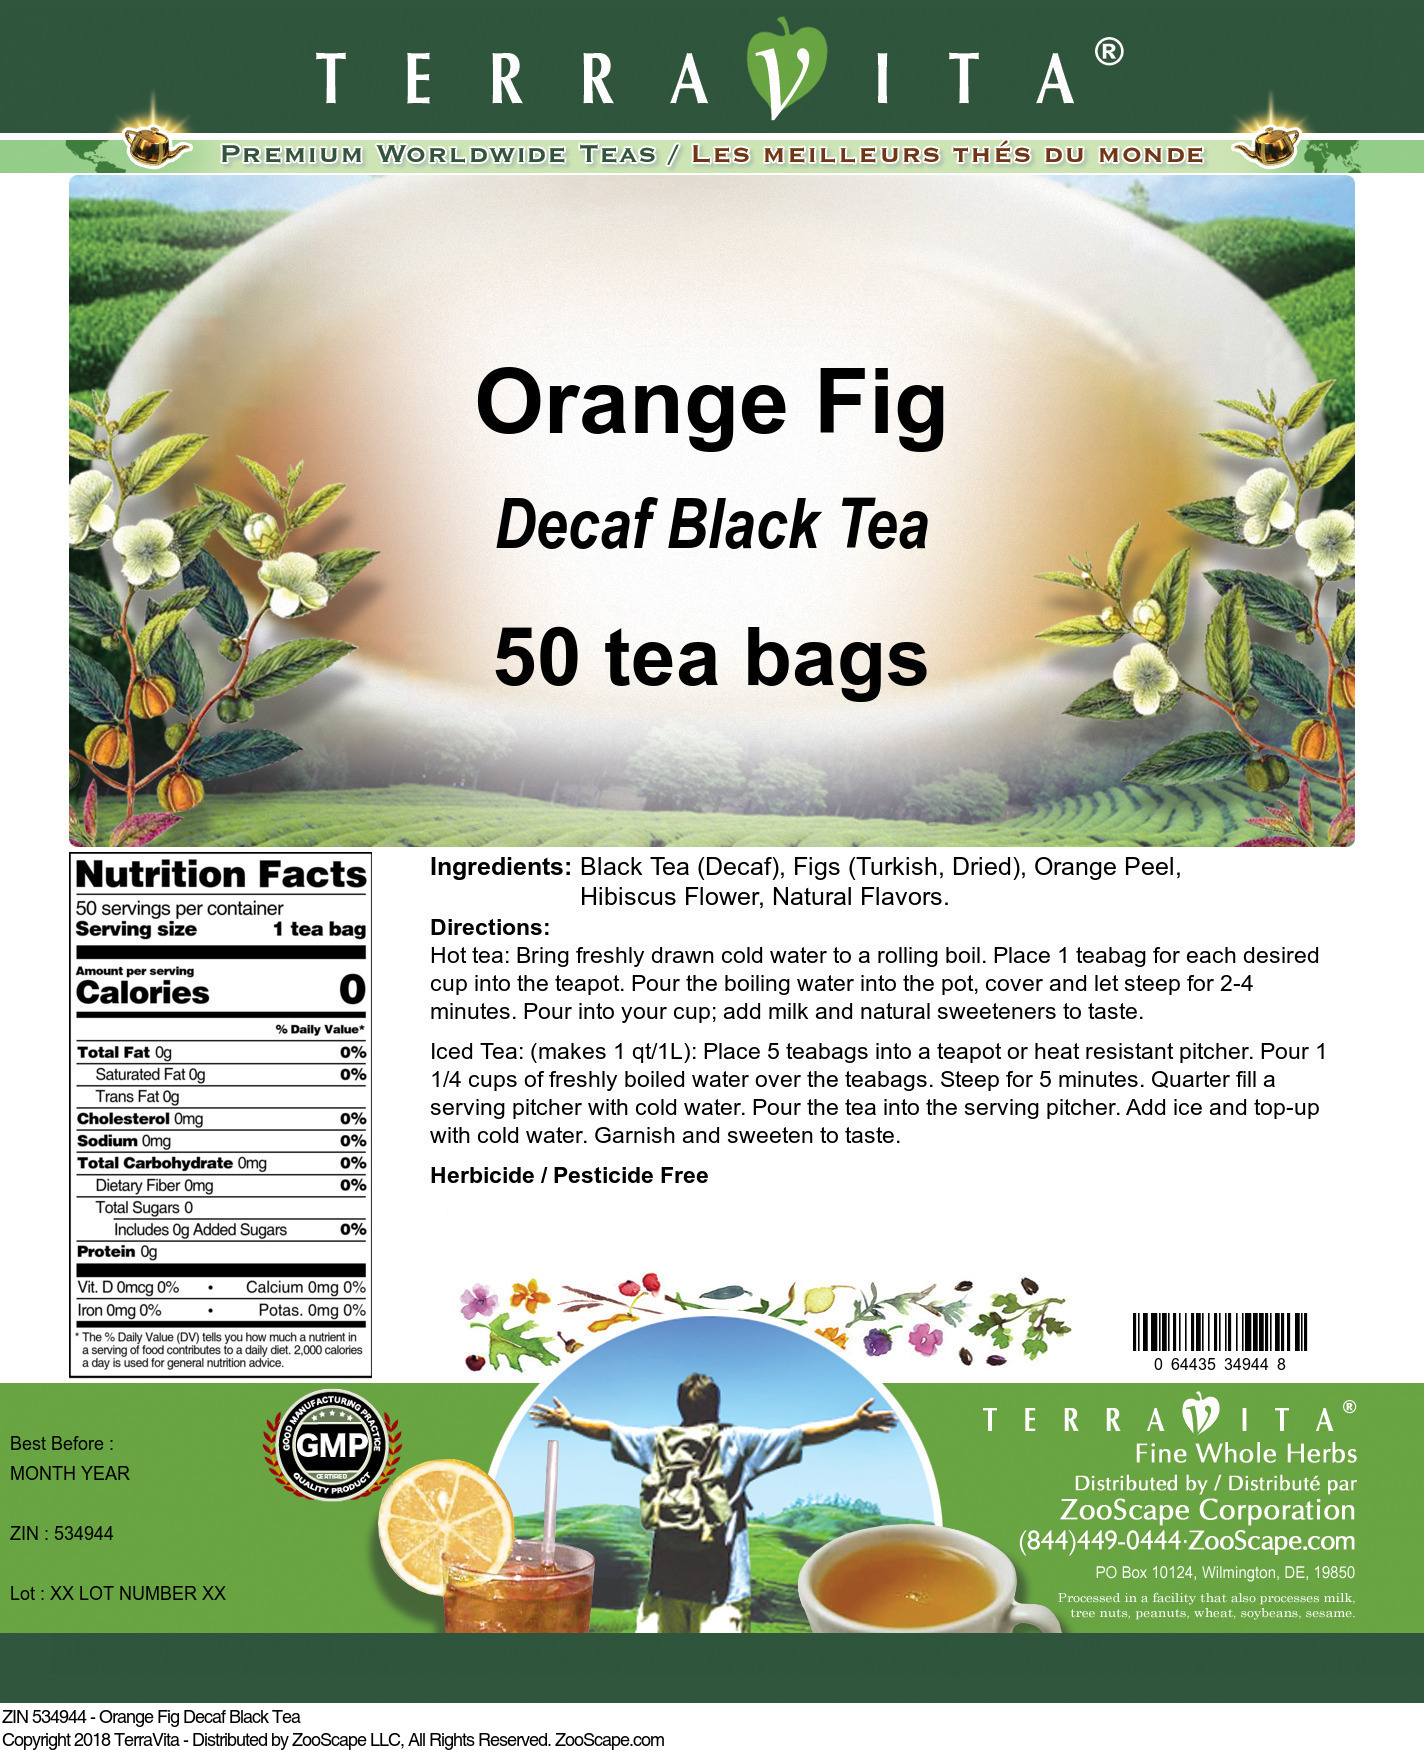 Orange Fig Decaf Black Tea